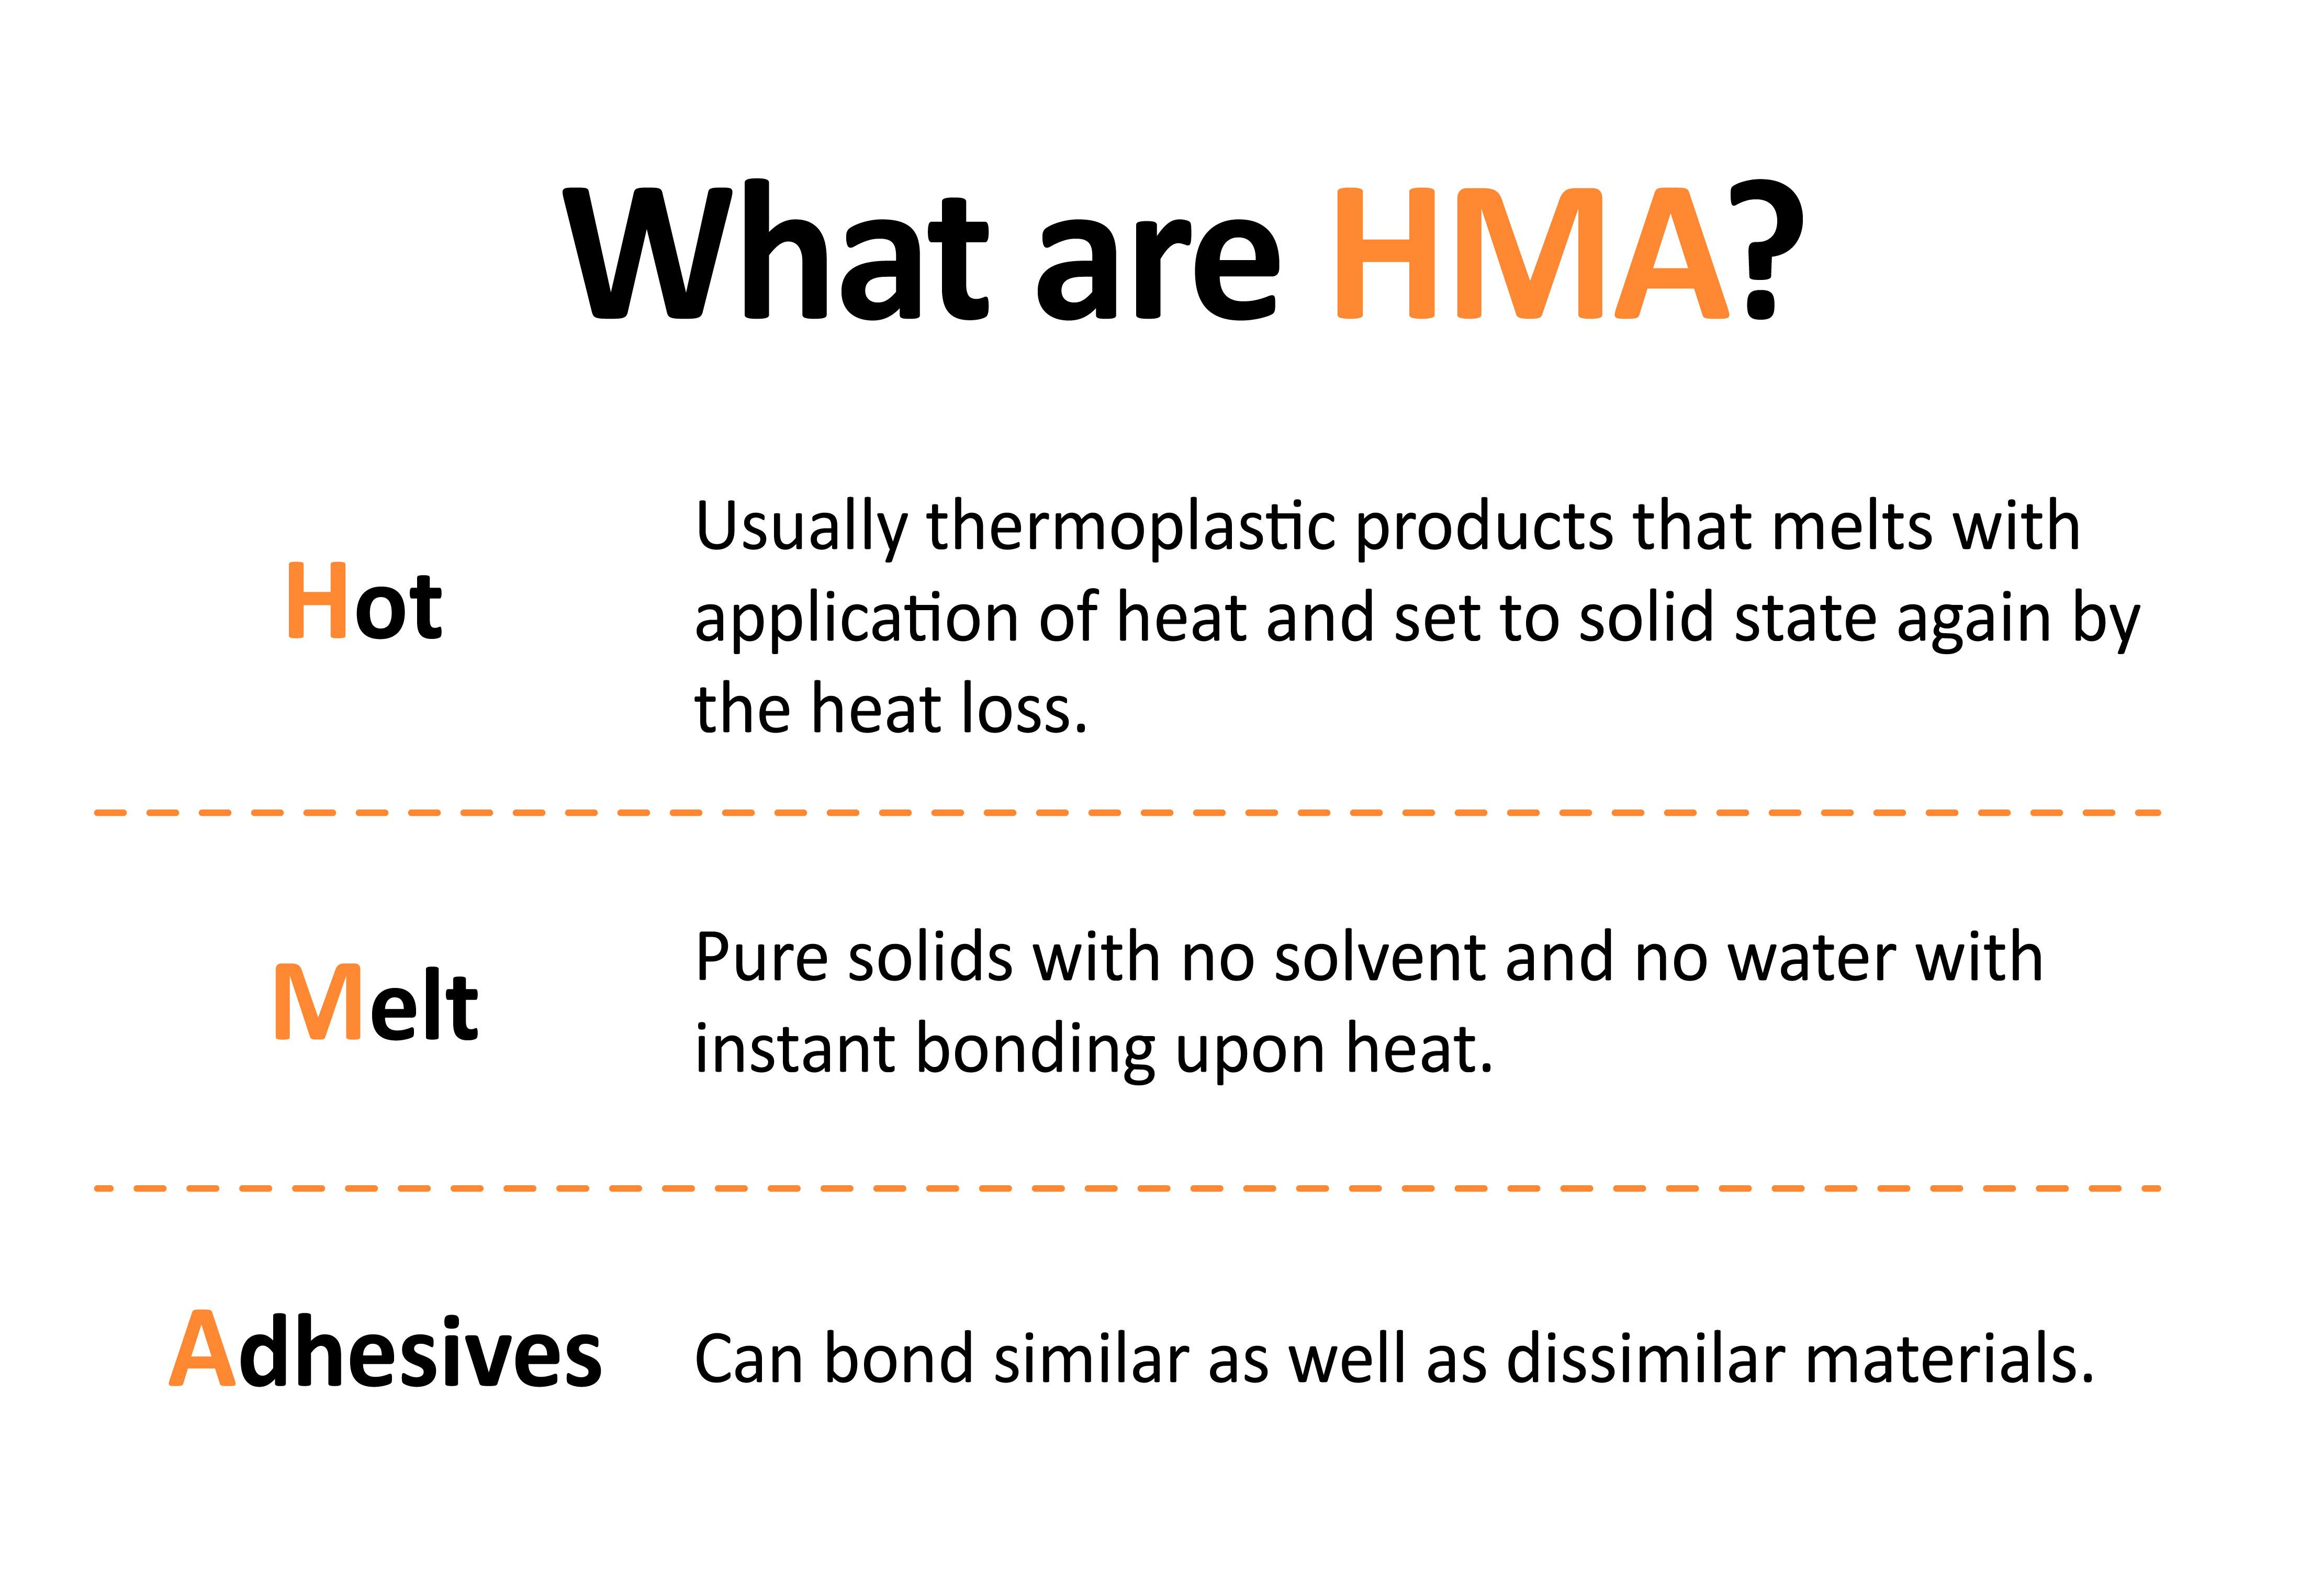 HMA laminate/adhesive